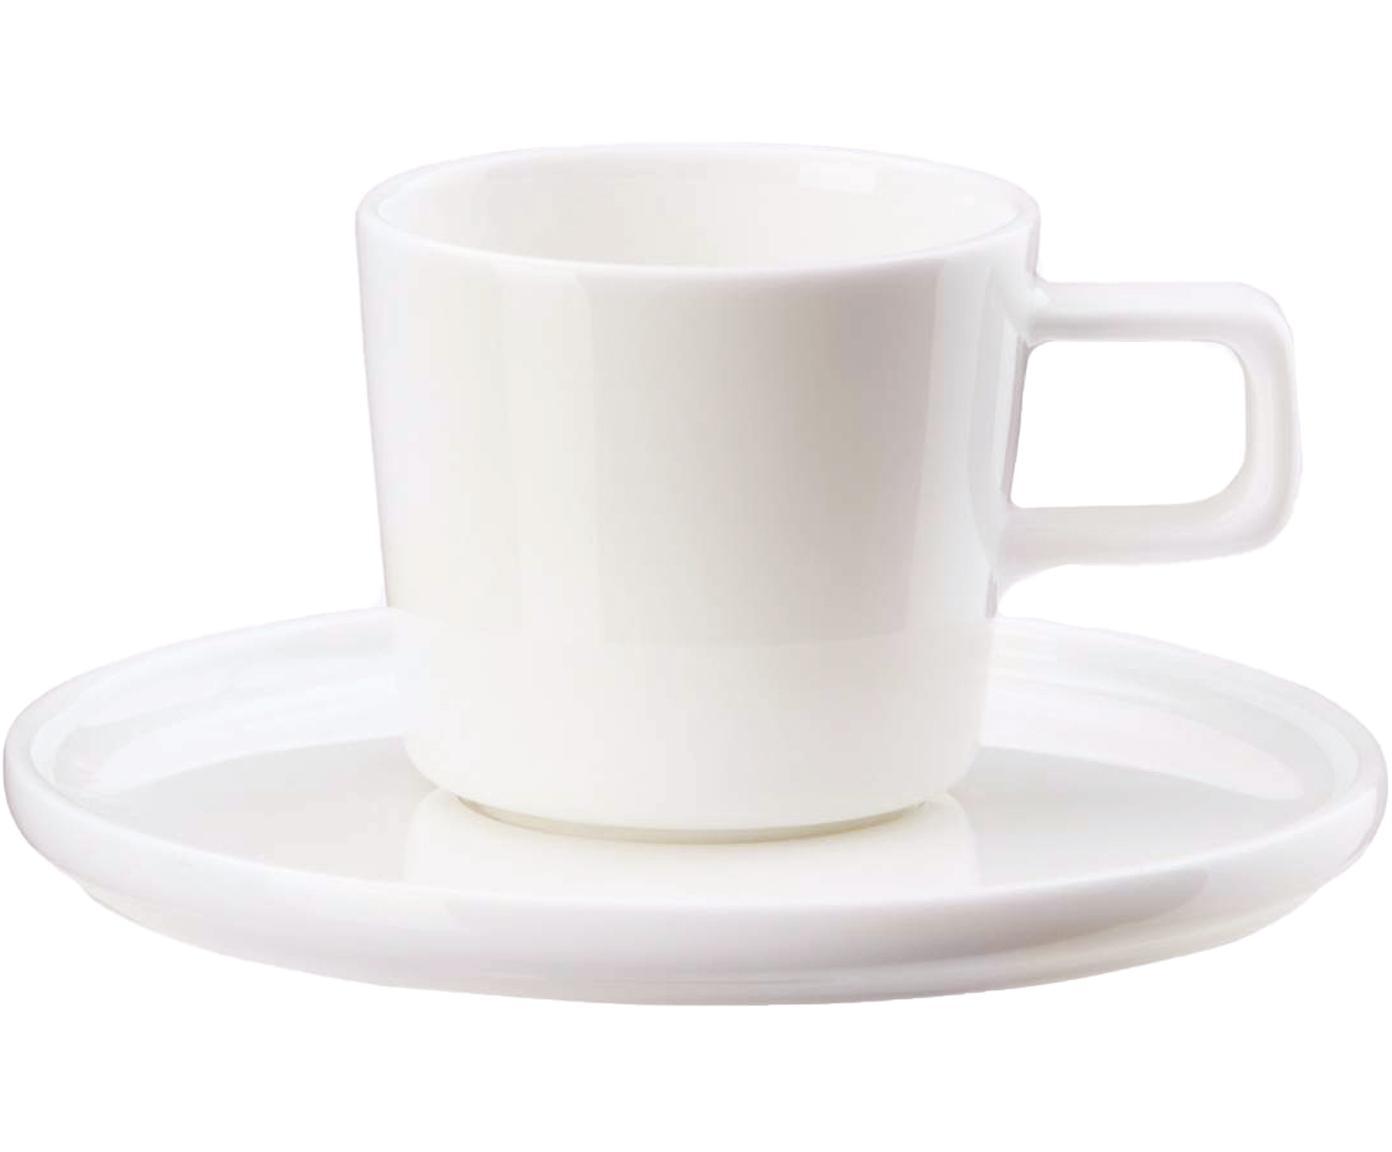 Set de tazas Oco, 12pzas., Porcelana fina, Blanco, Ø 6 x Al 7 cm